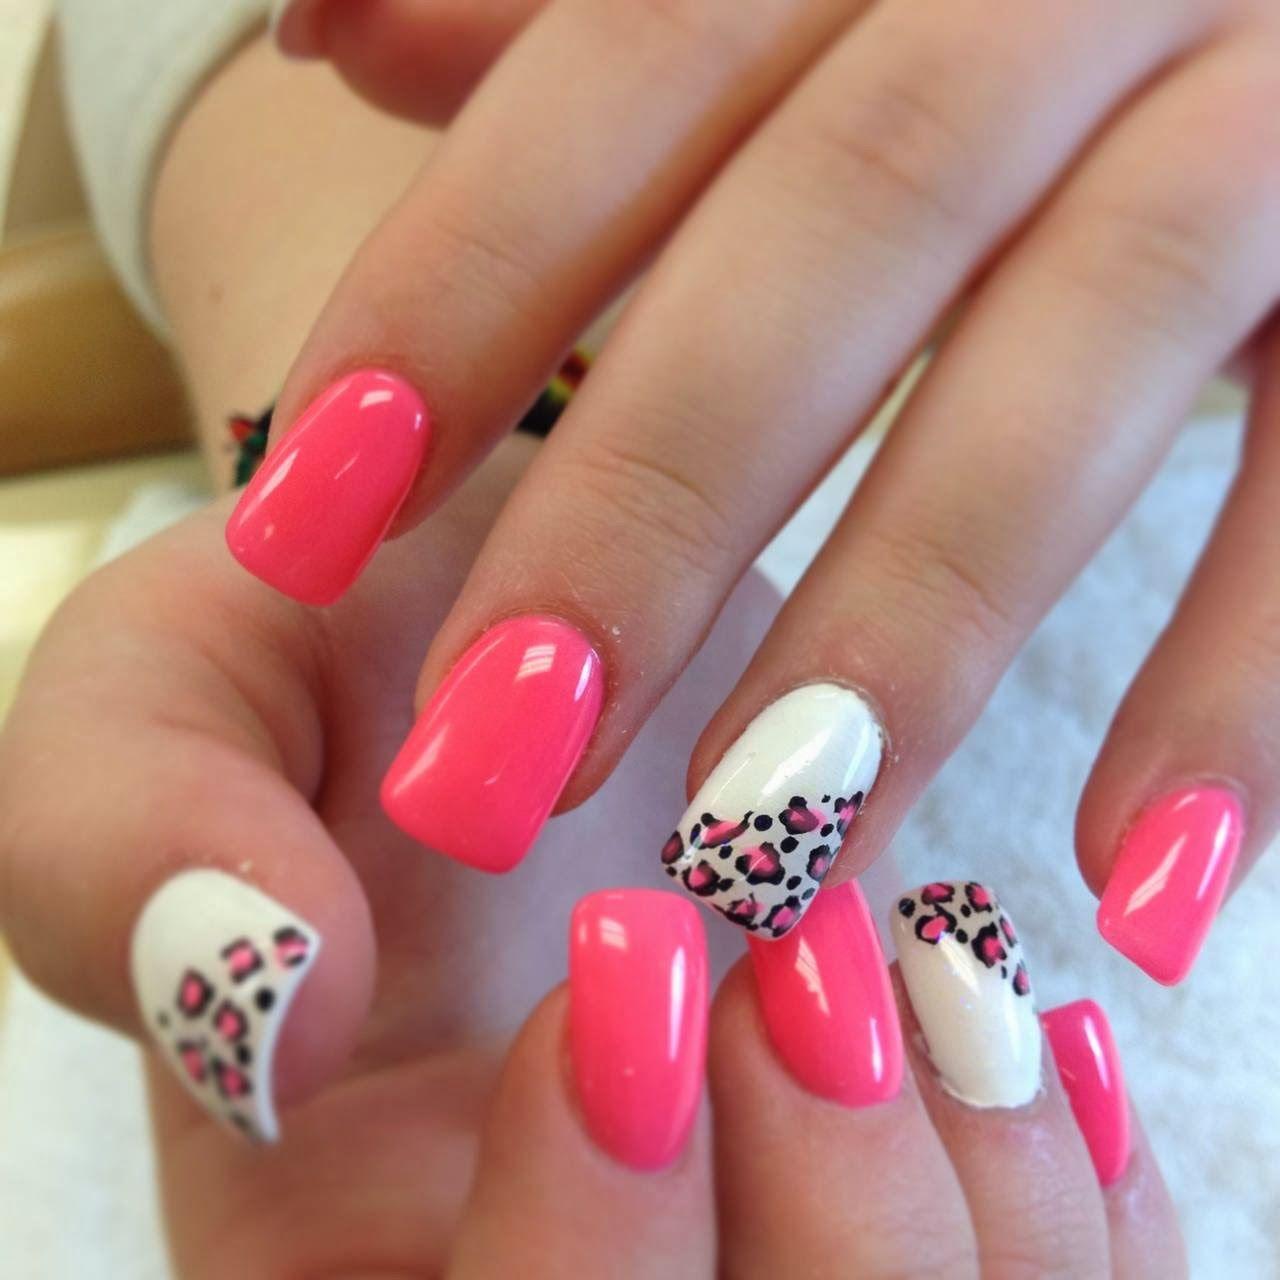 acrylic nail designs almond shaped   Nail Art   Pinterest   Acrylic ...